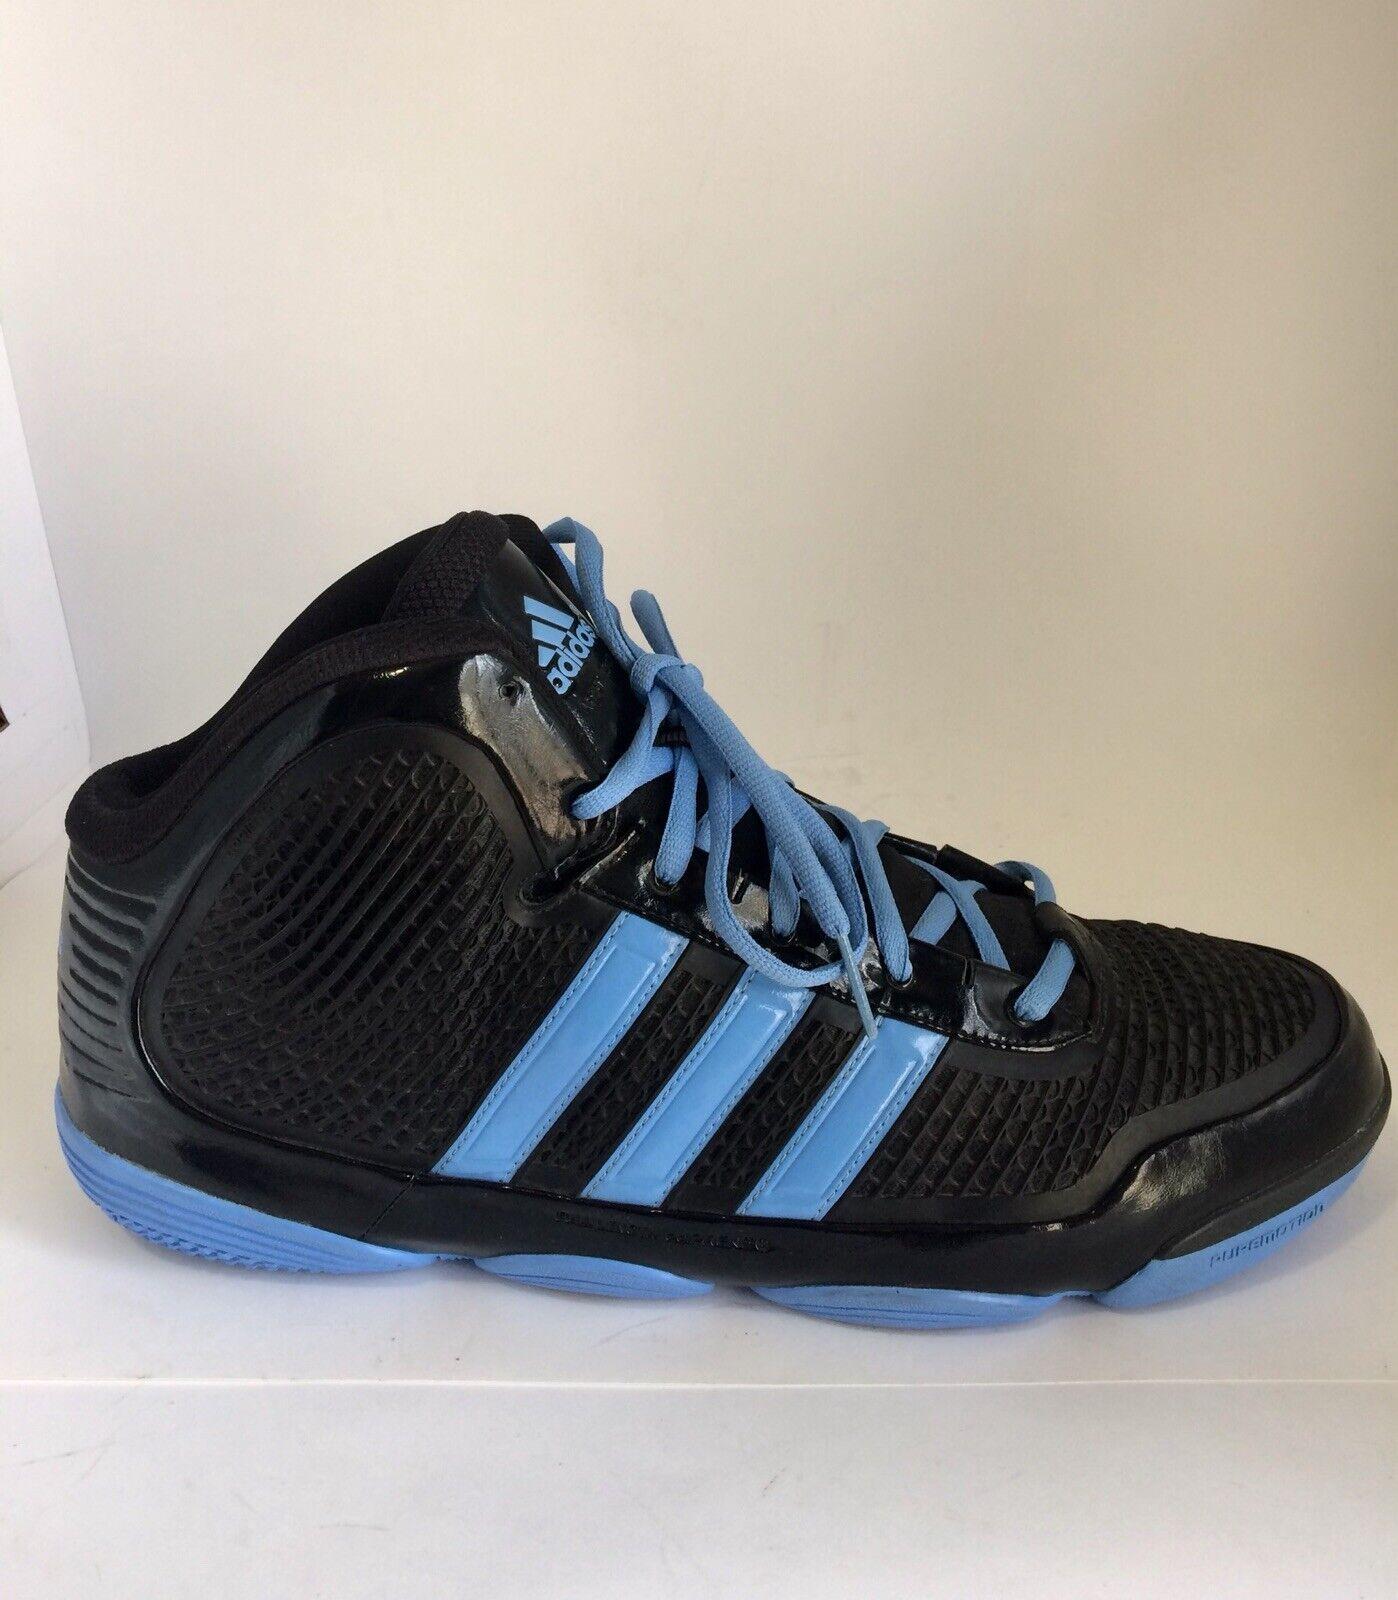 Adidas Mens AdiPure NBA All Star Edition 2011 Basketball Mid Top Shoes SZ 18